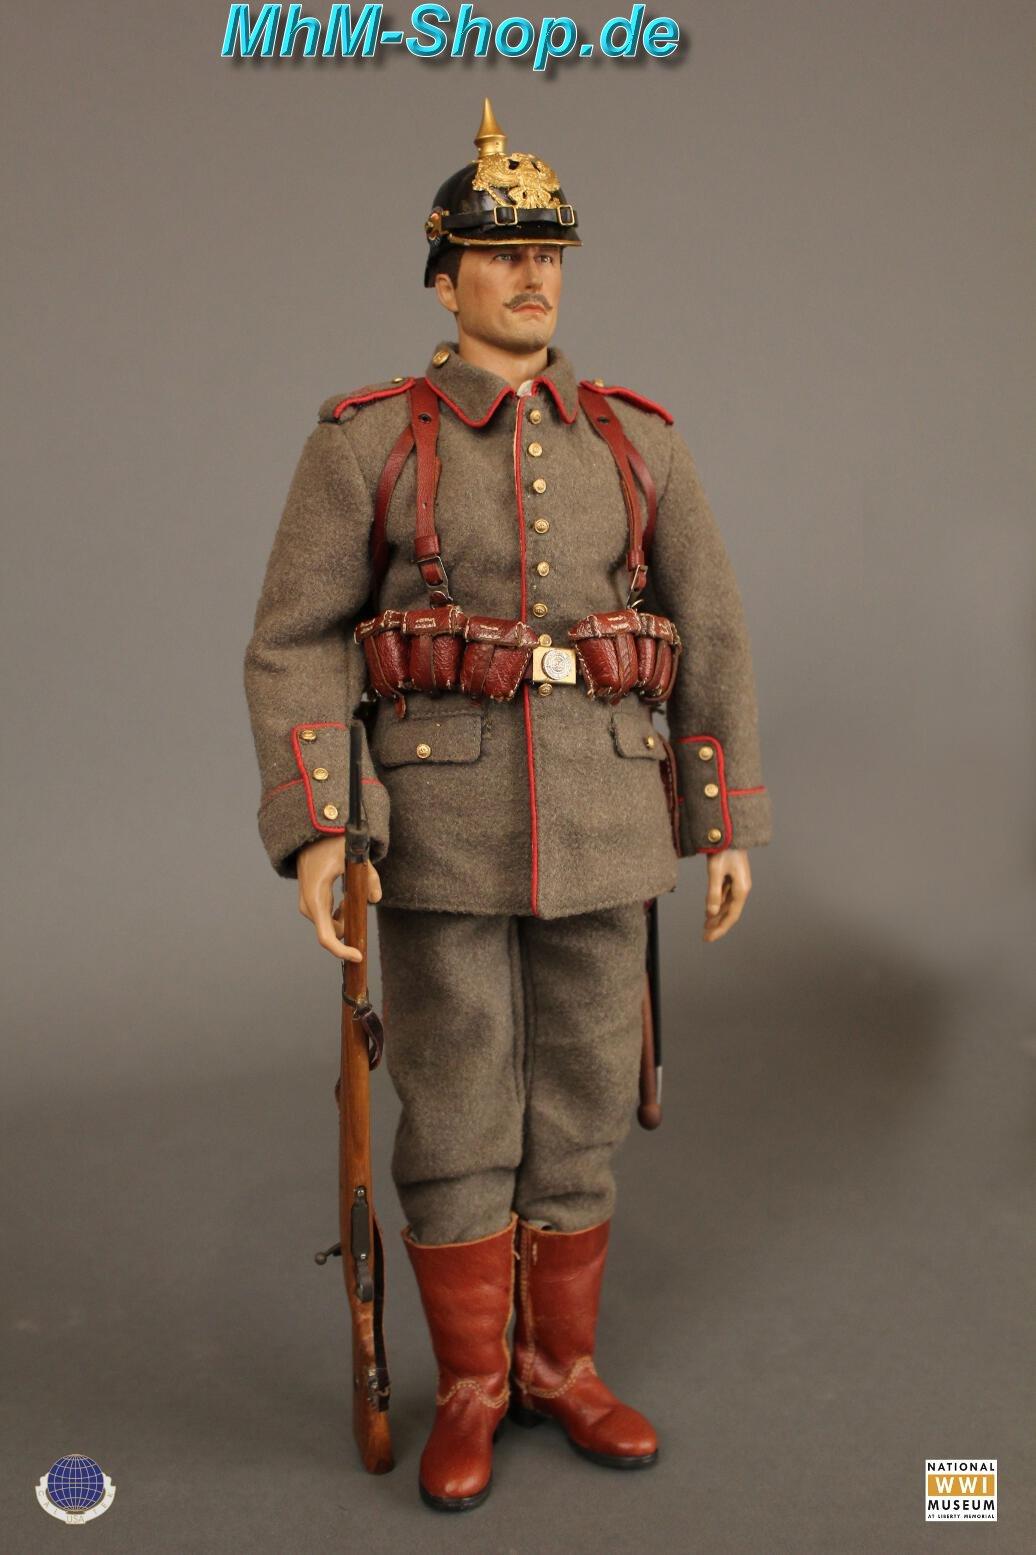 CalTek WWI Imperial German Infantryman / Shirt in white 1/6